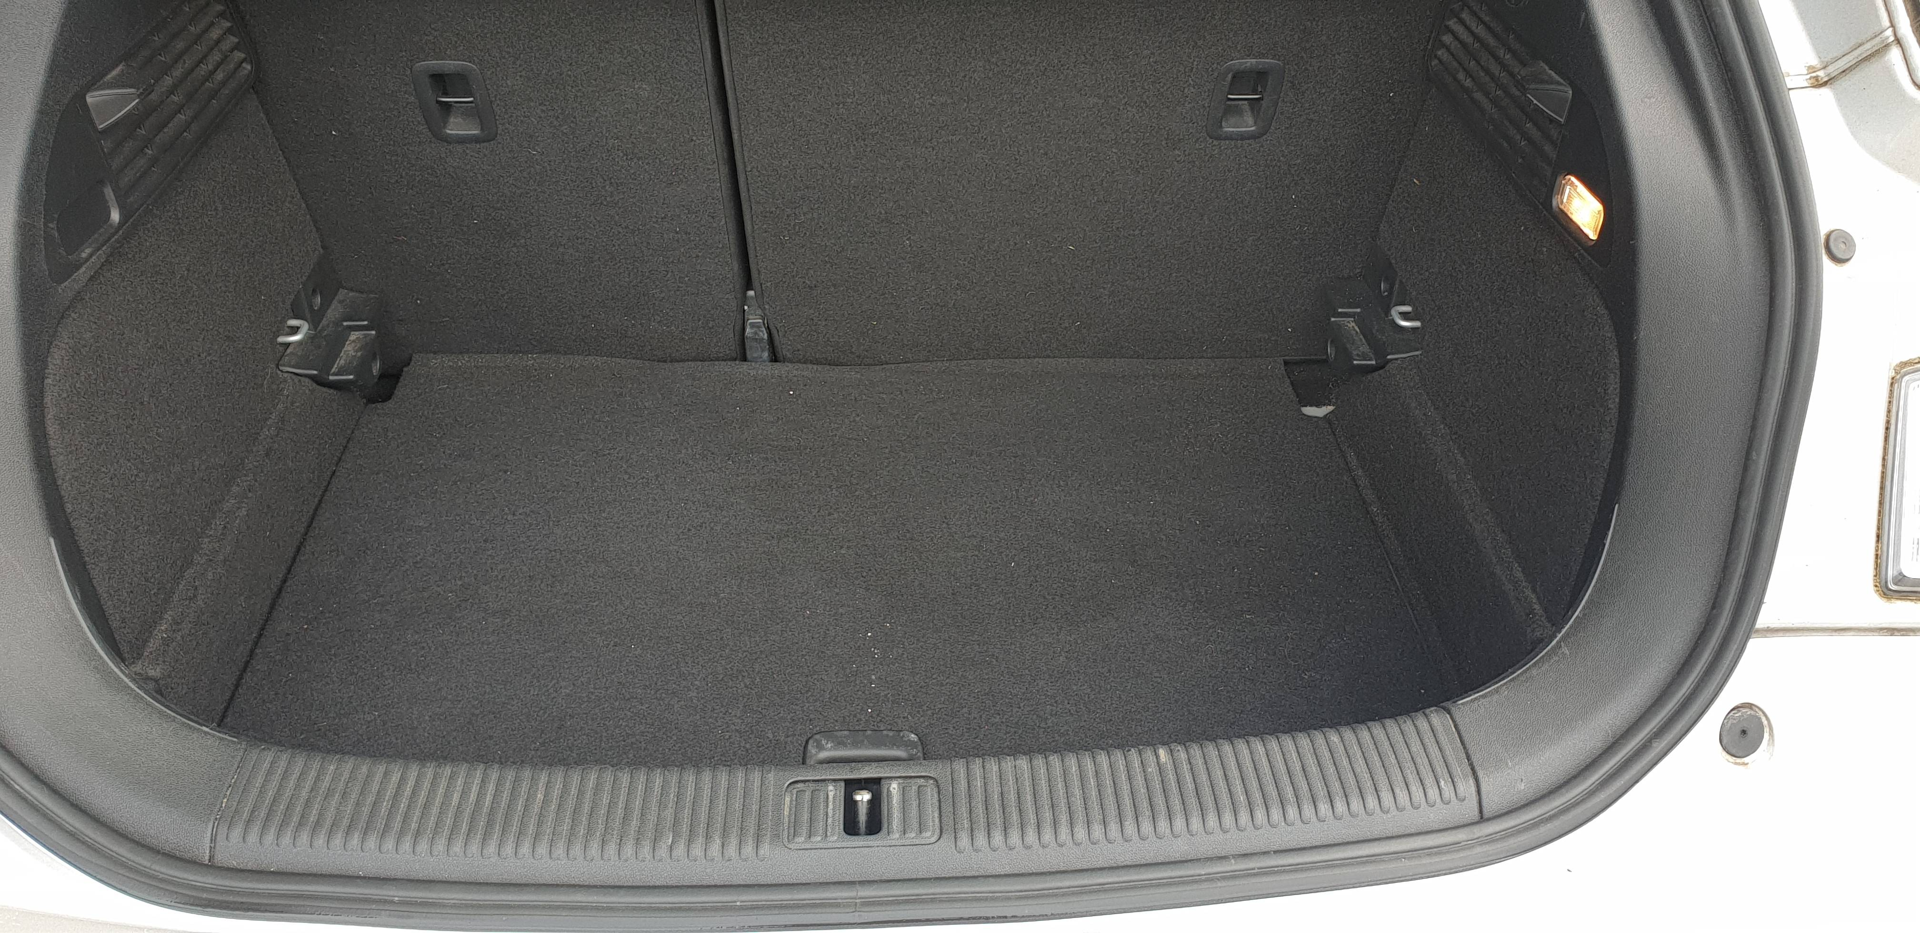 7 - A1 Sportback 1.2 TFSI 86